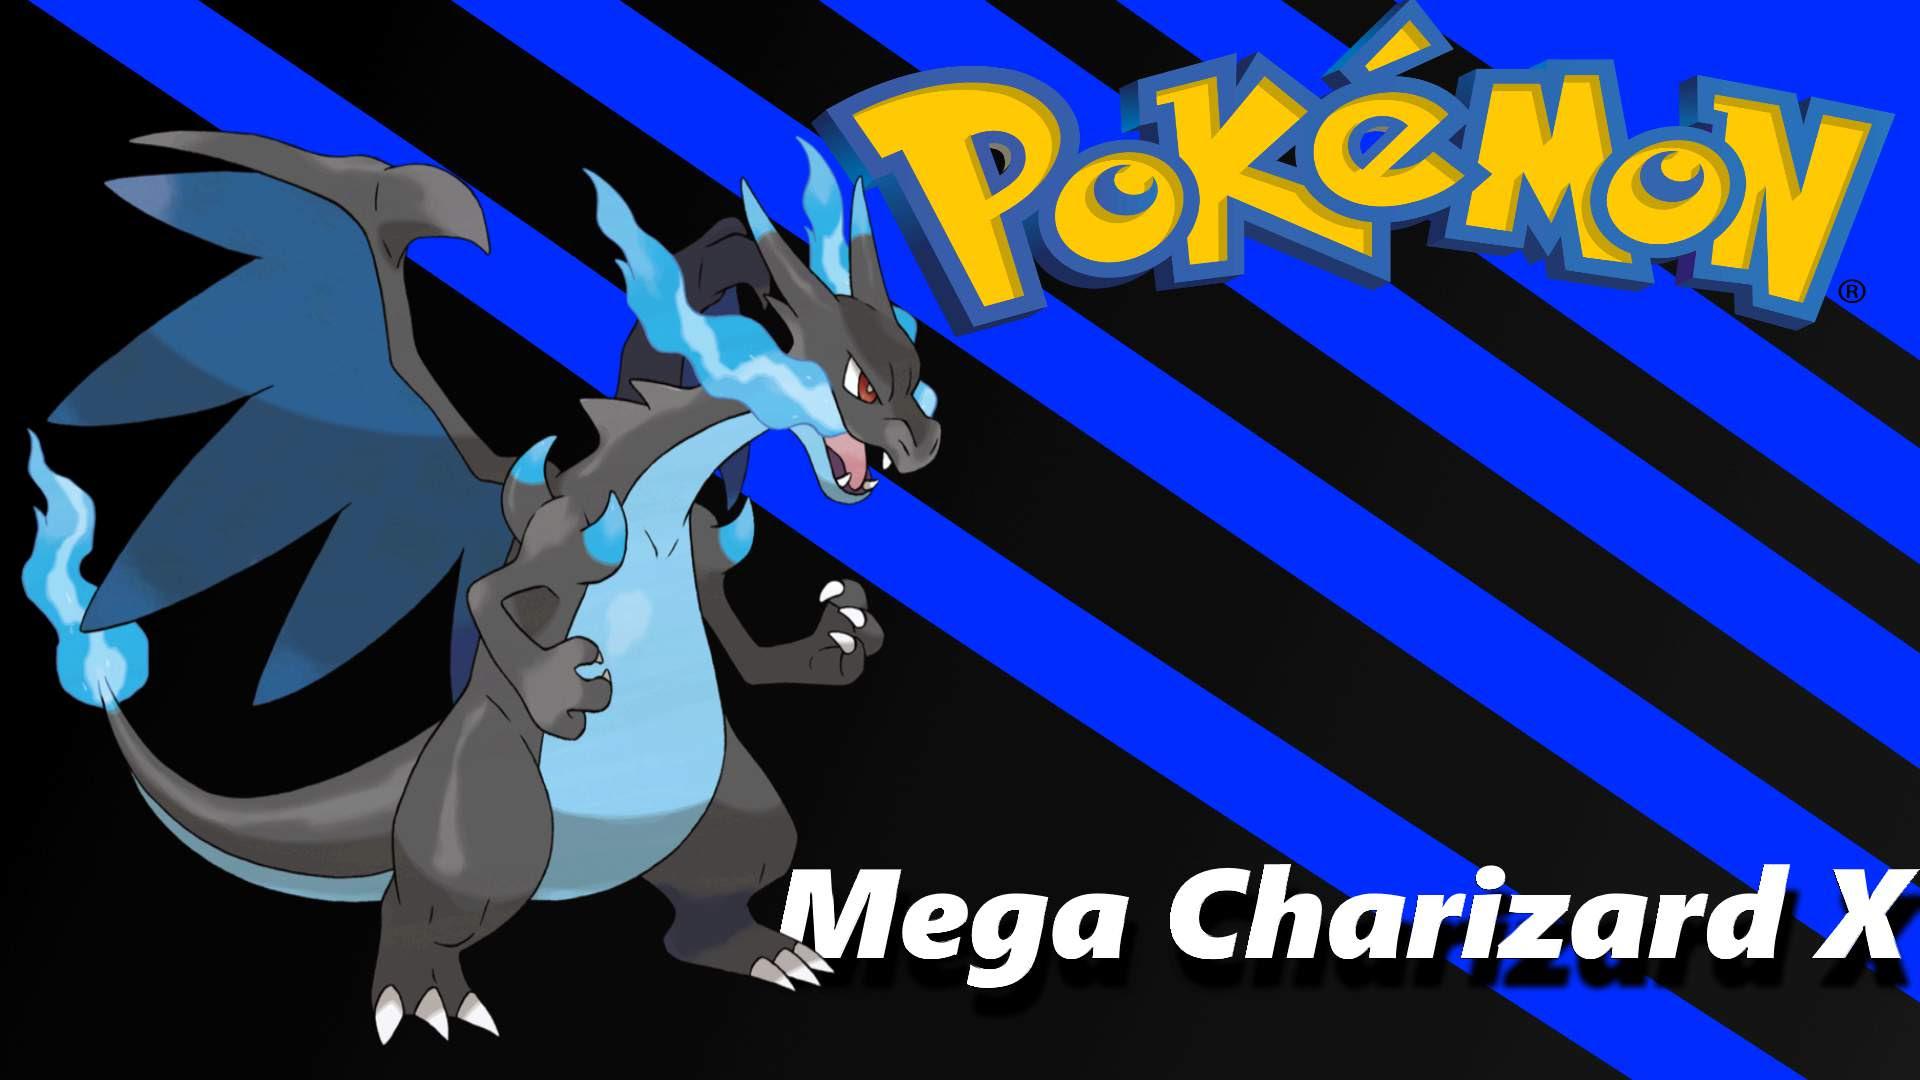 Custom Mega Charizard X Wallpaper Pokemon Amino